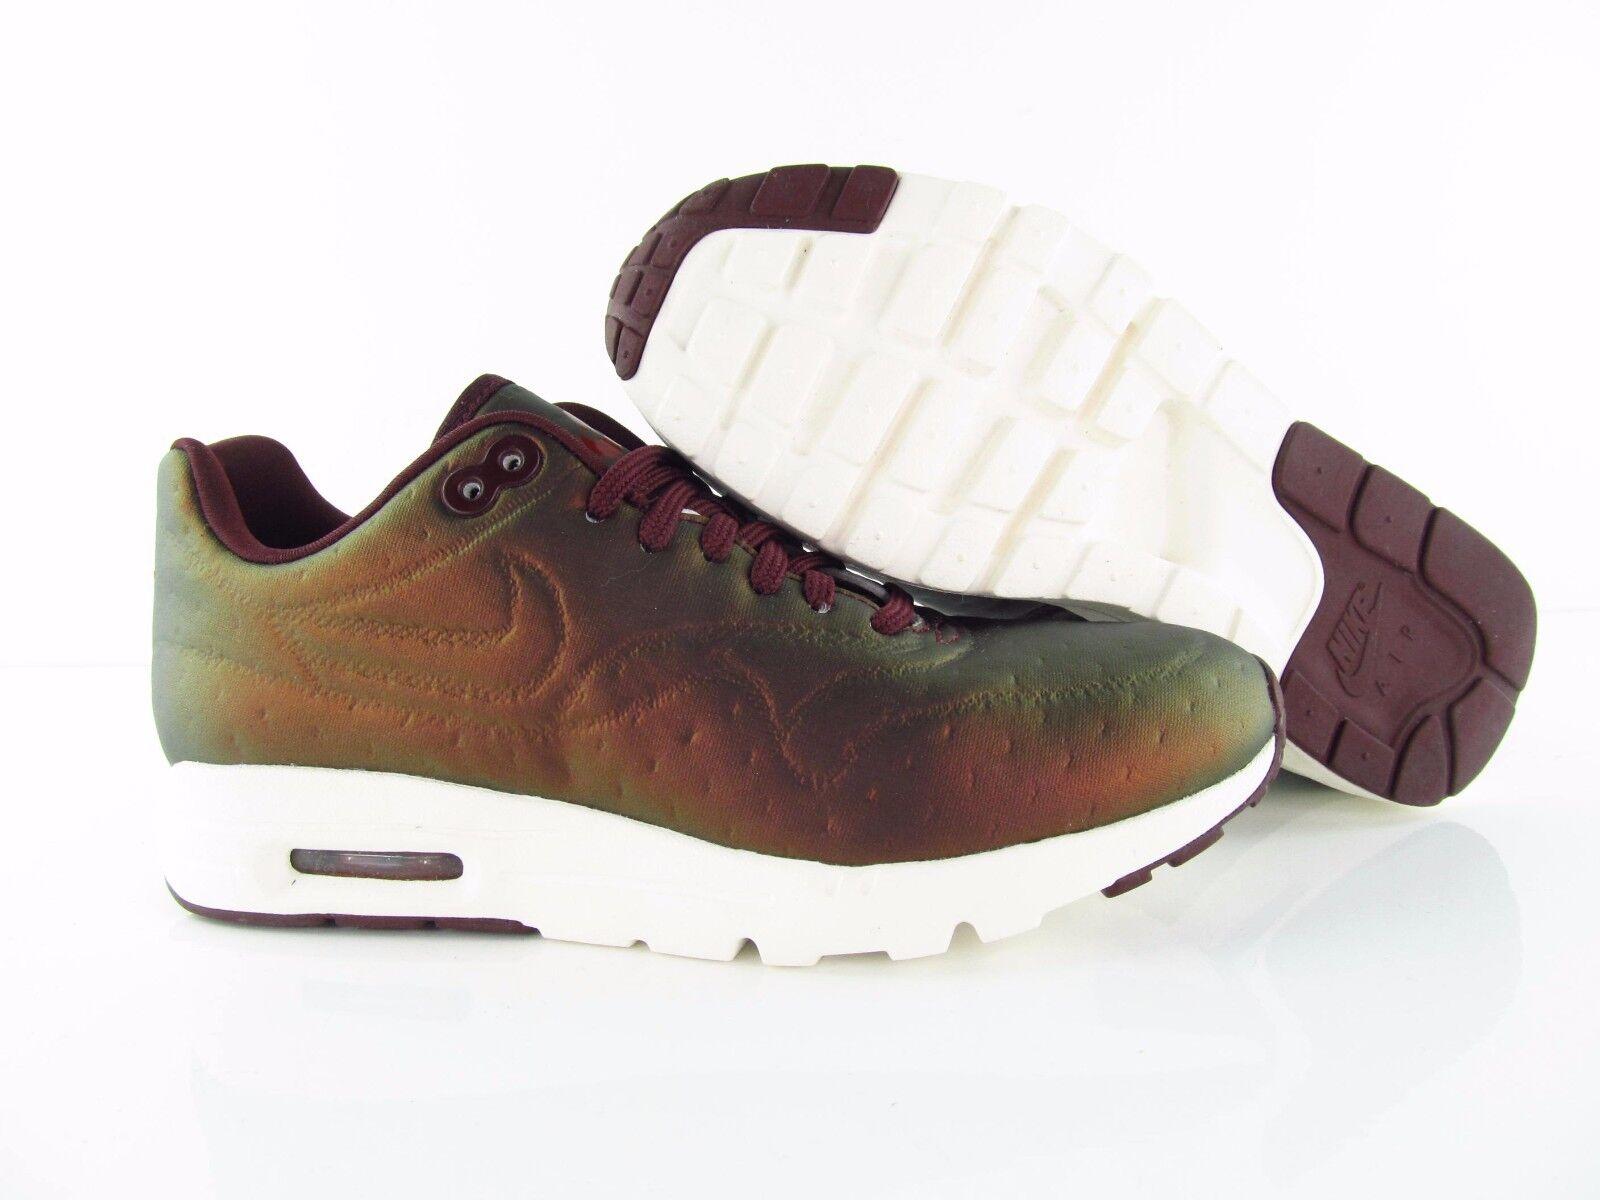 Nike Wmns Air Max 1 Ultra Ultra 1 Premium Jacquard Metallic Mahogany US_7  Eur 38 0f7e0b